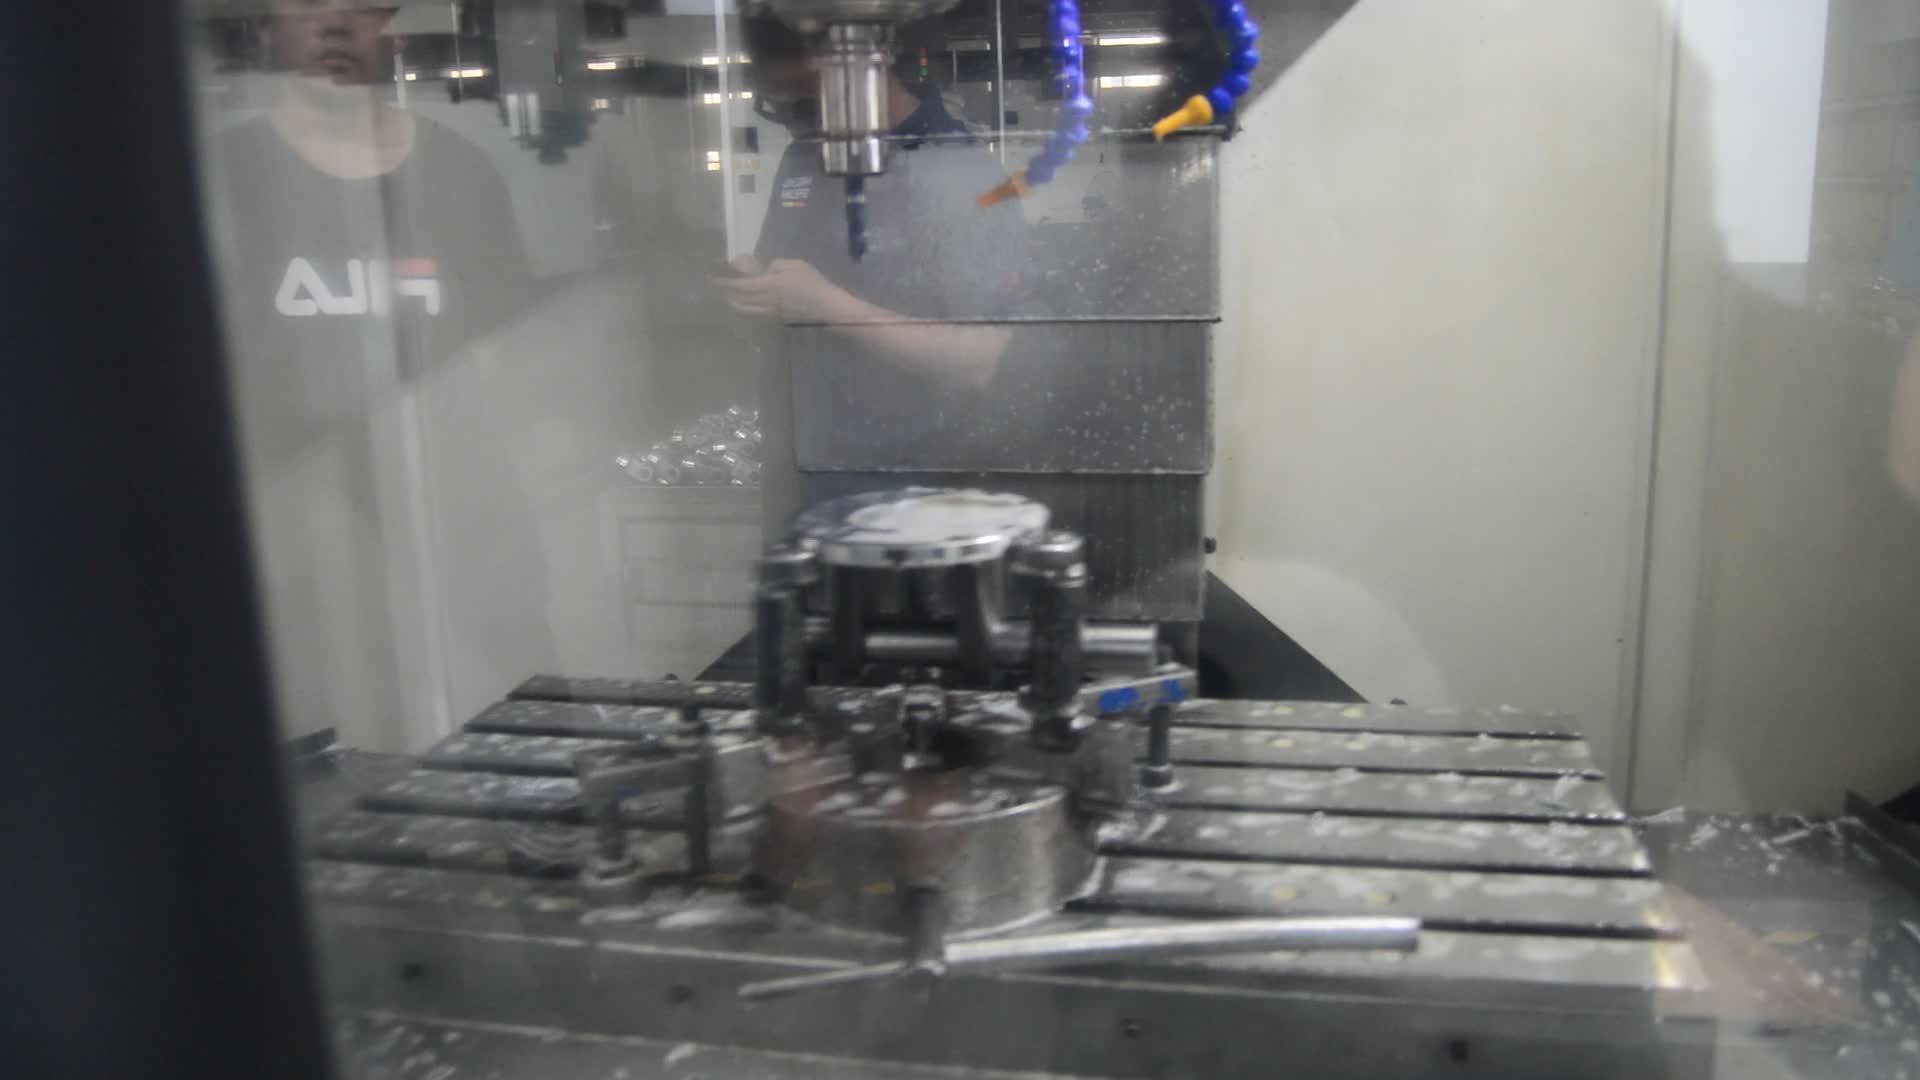 Drive Shaft Component Prop Shaft Flange for Truck Drive Shaft Parts